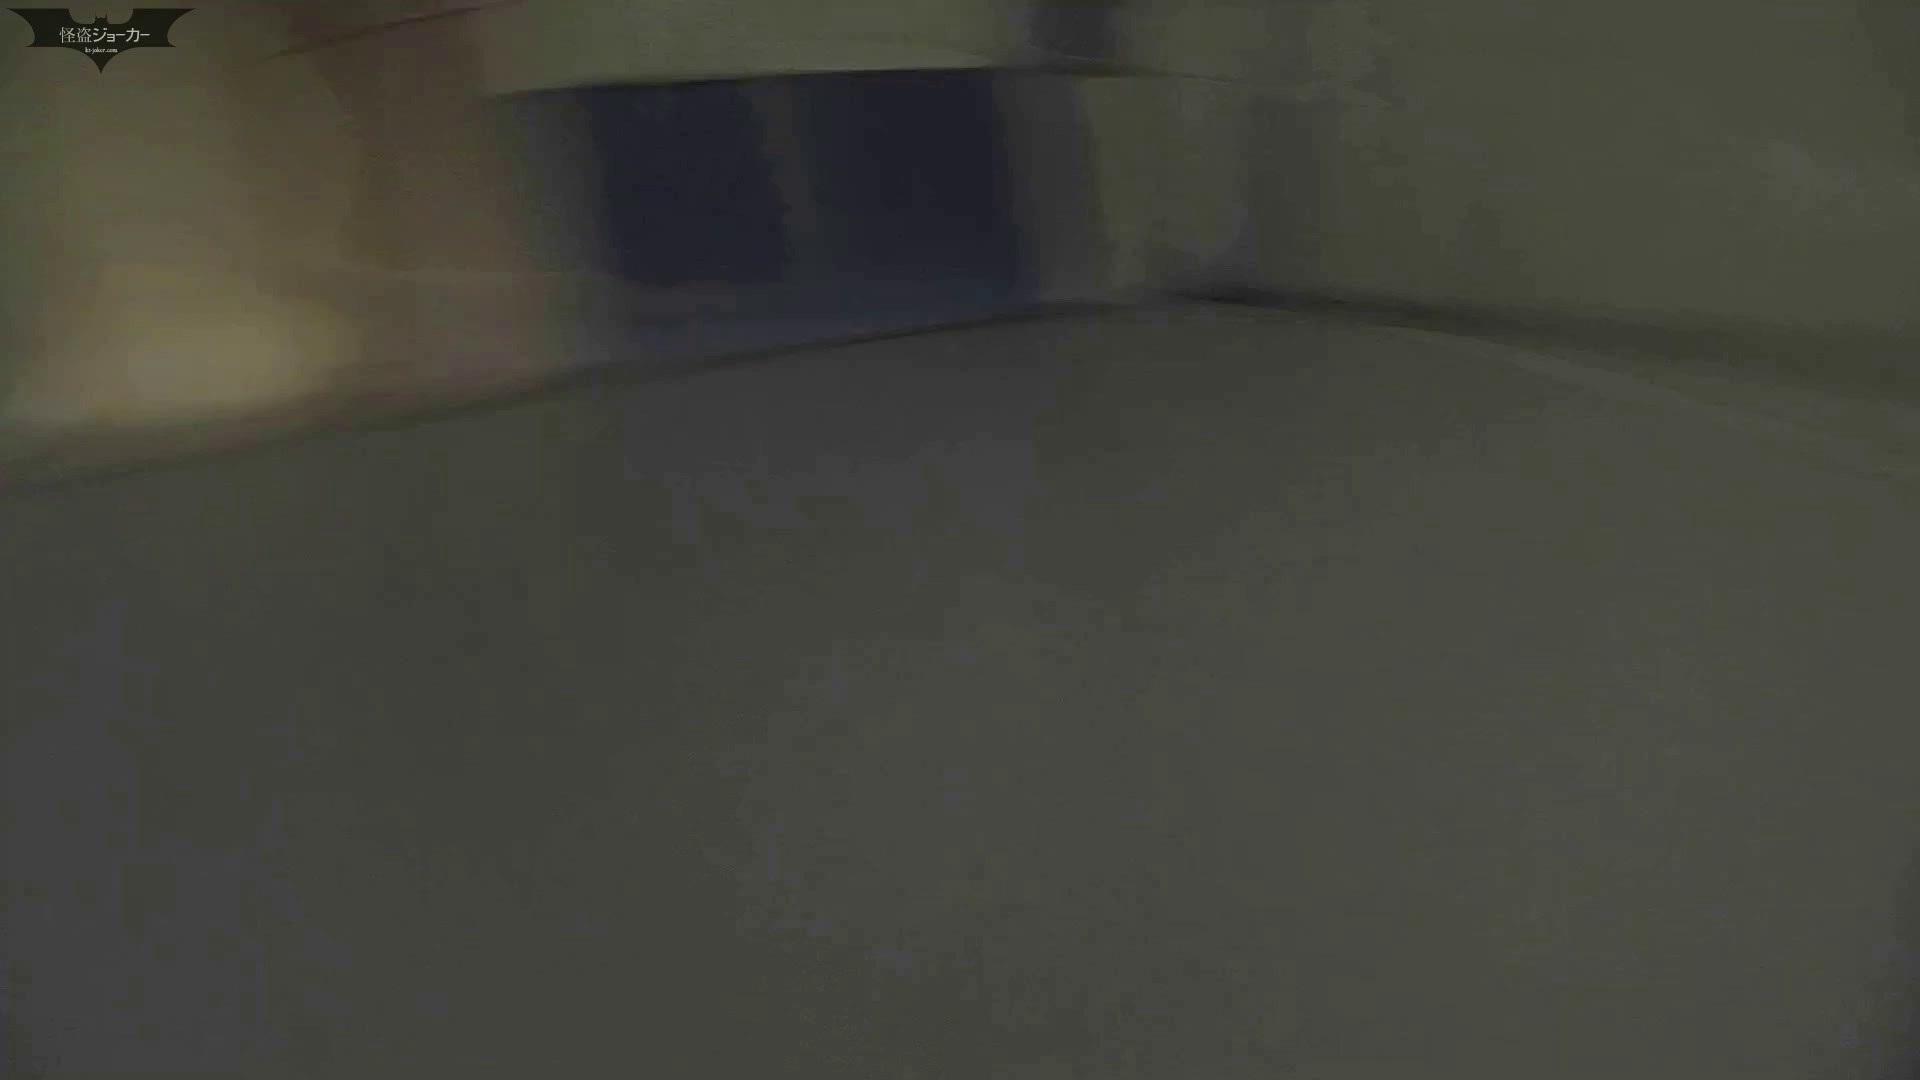 Vol.06 ピチピチが入室きめ細かくマッシュルームのような肌に癒される 洗面所 | テクニック  35画像 7